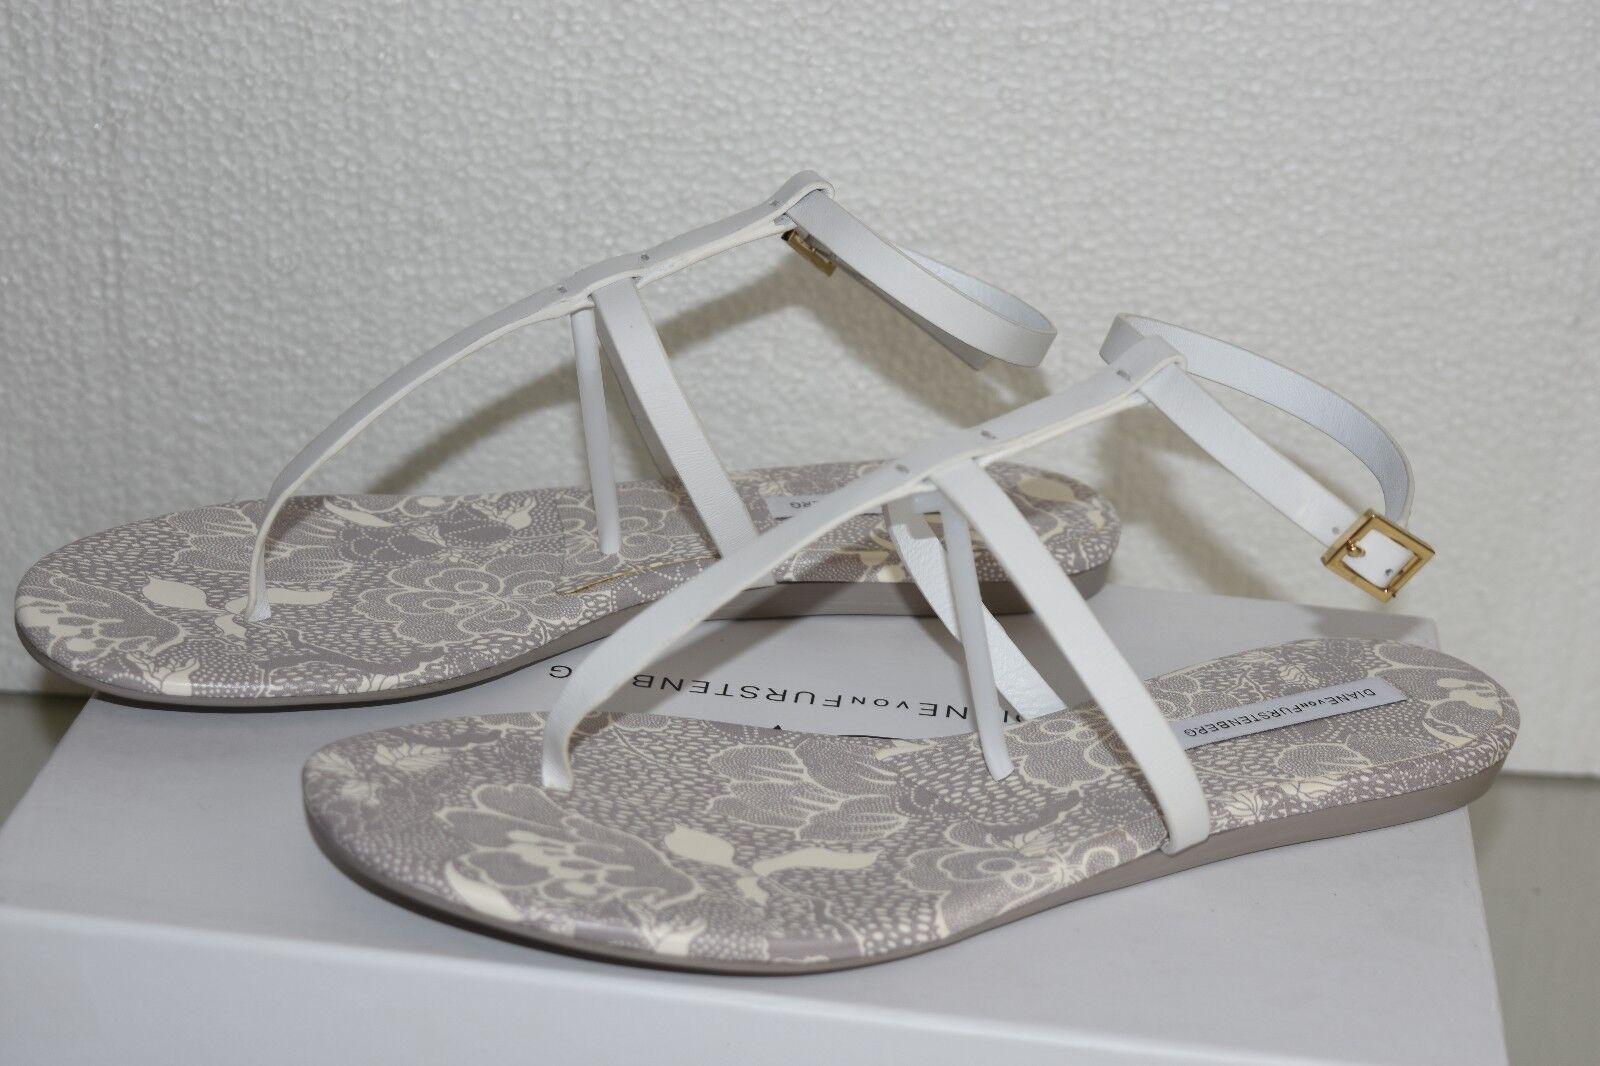 NEW DVF DIANE FURSTENBERG PERUGIA T-STRAP SANDALS WEISS LEATHER Schuhe 10 40